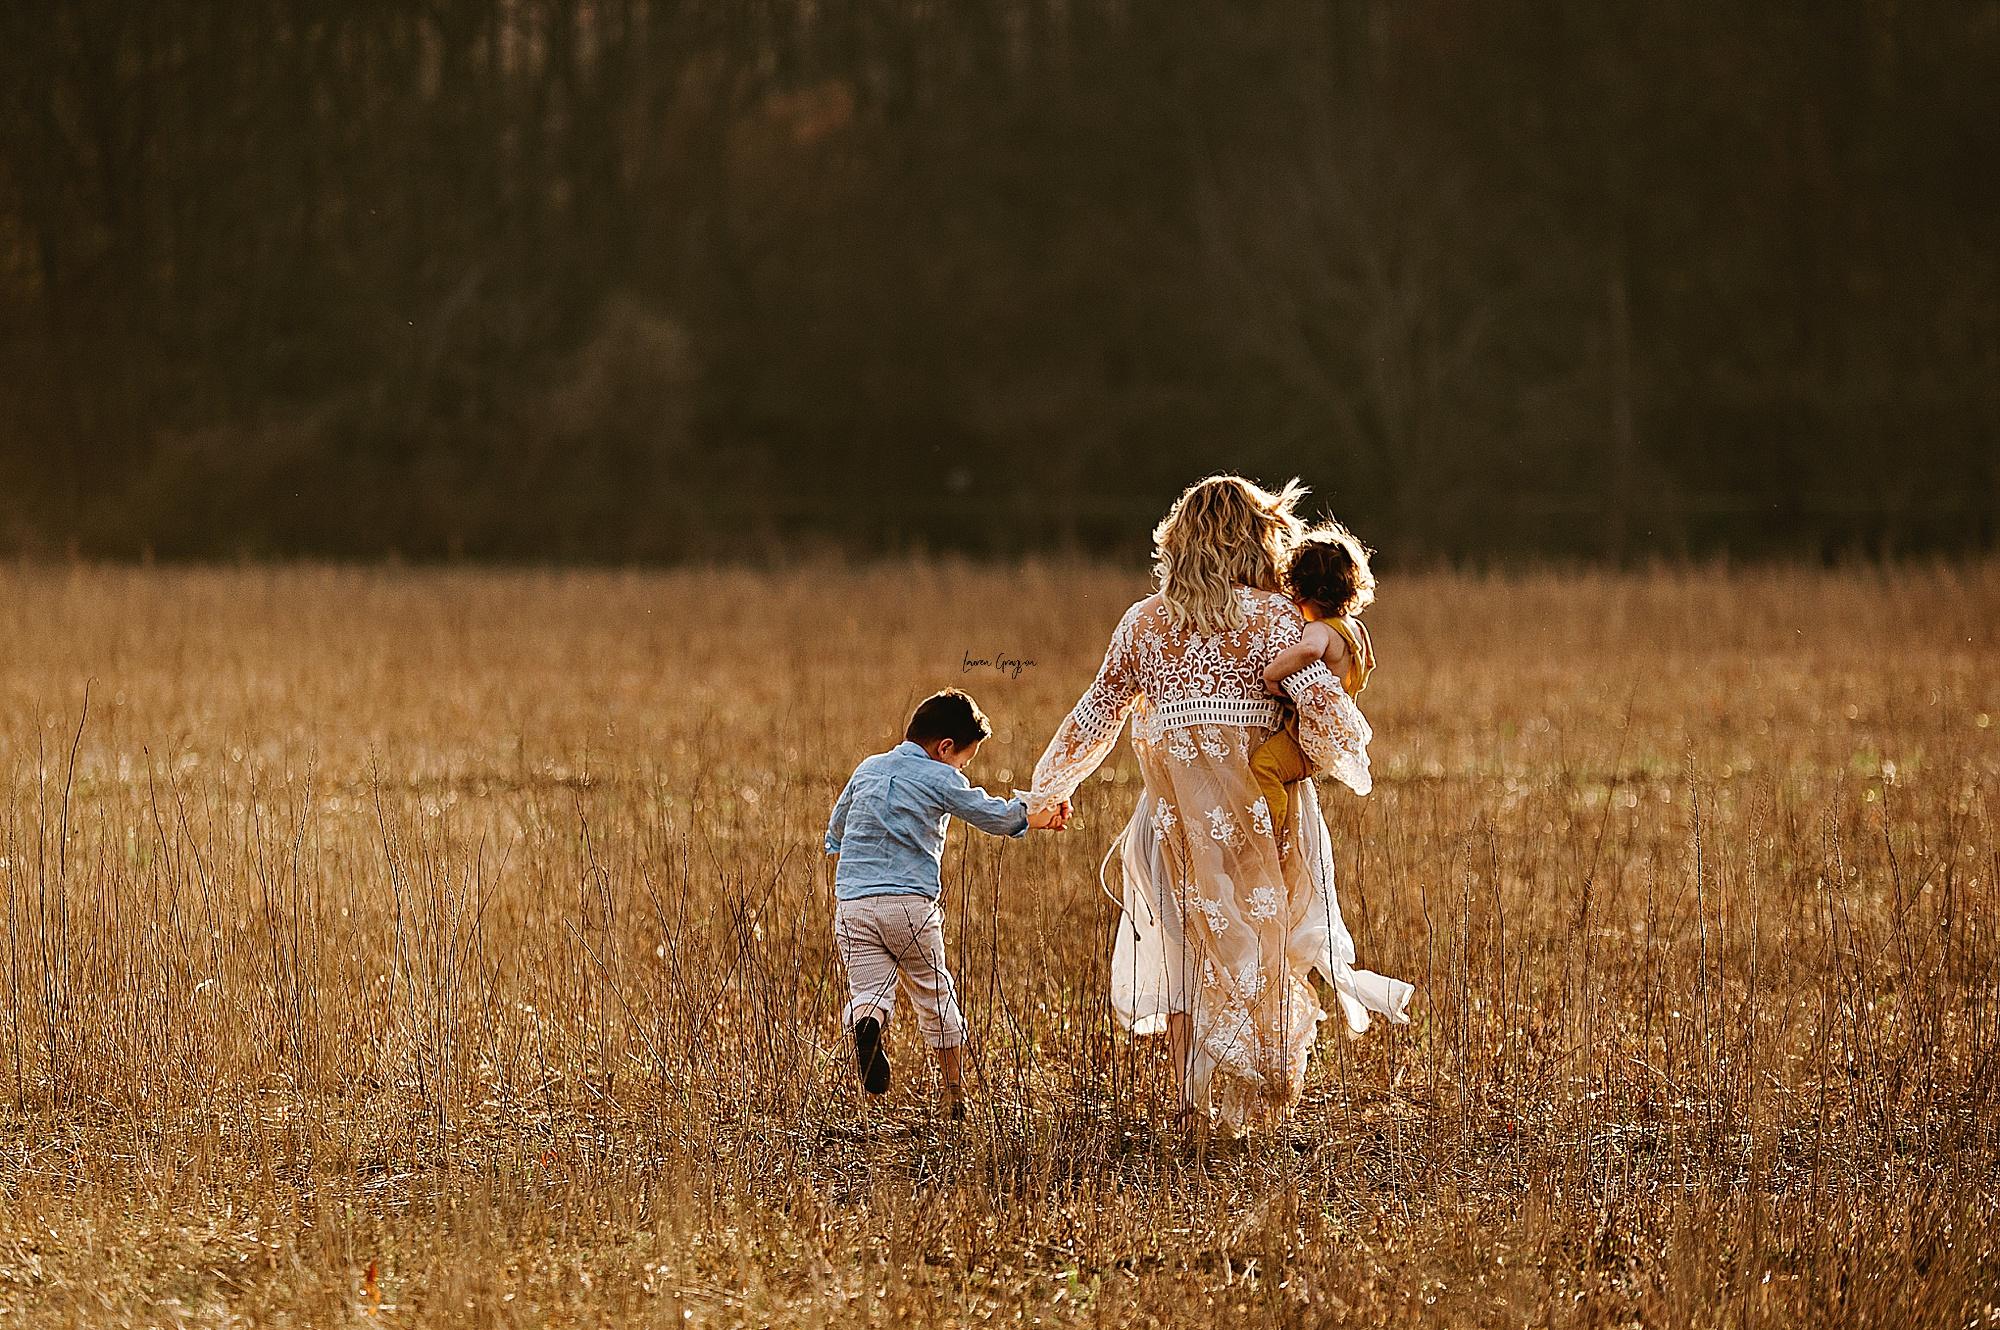 lauren-grayson-photography-akron-ohio-family-mom-boys-field-spring-outdoor-session_0012.jpg